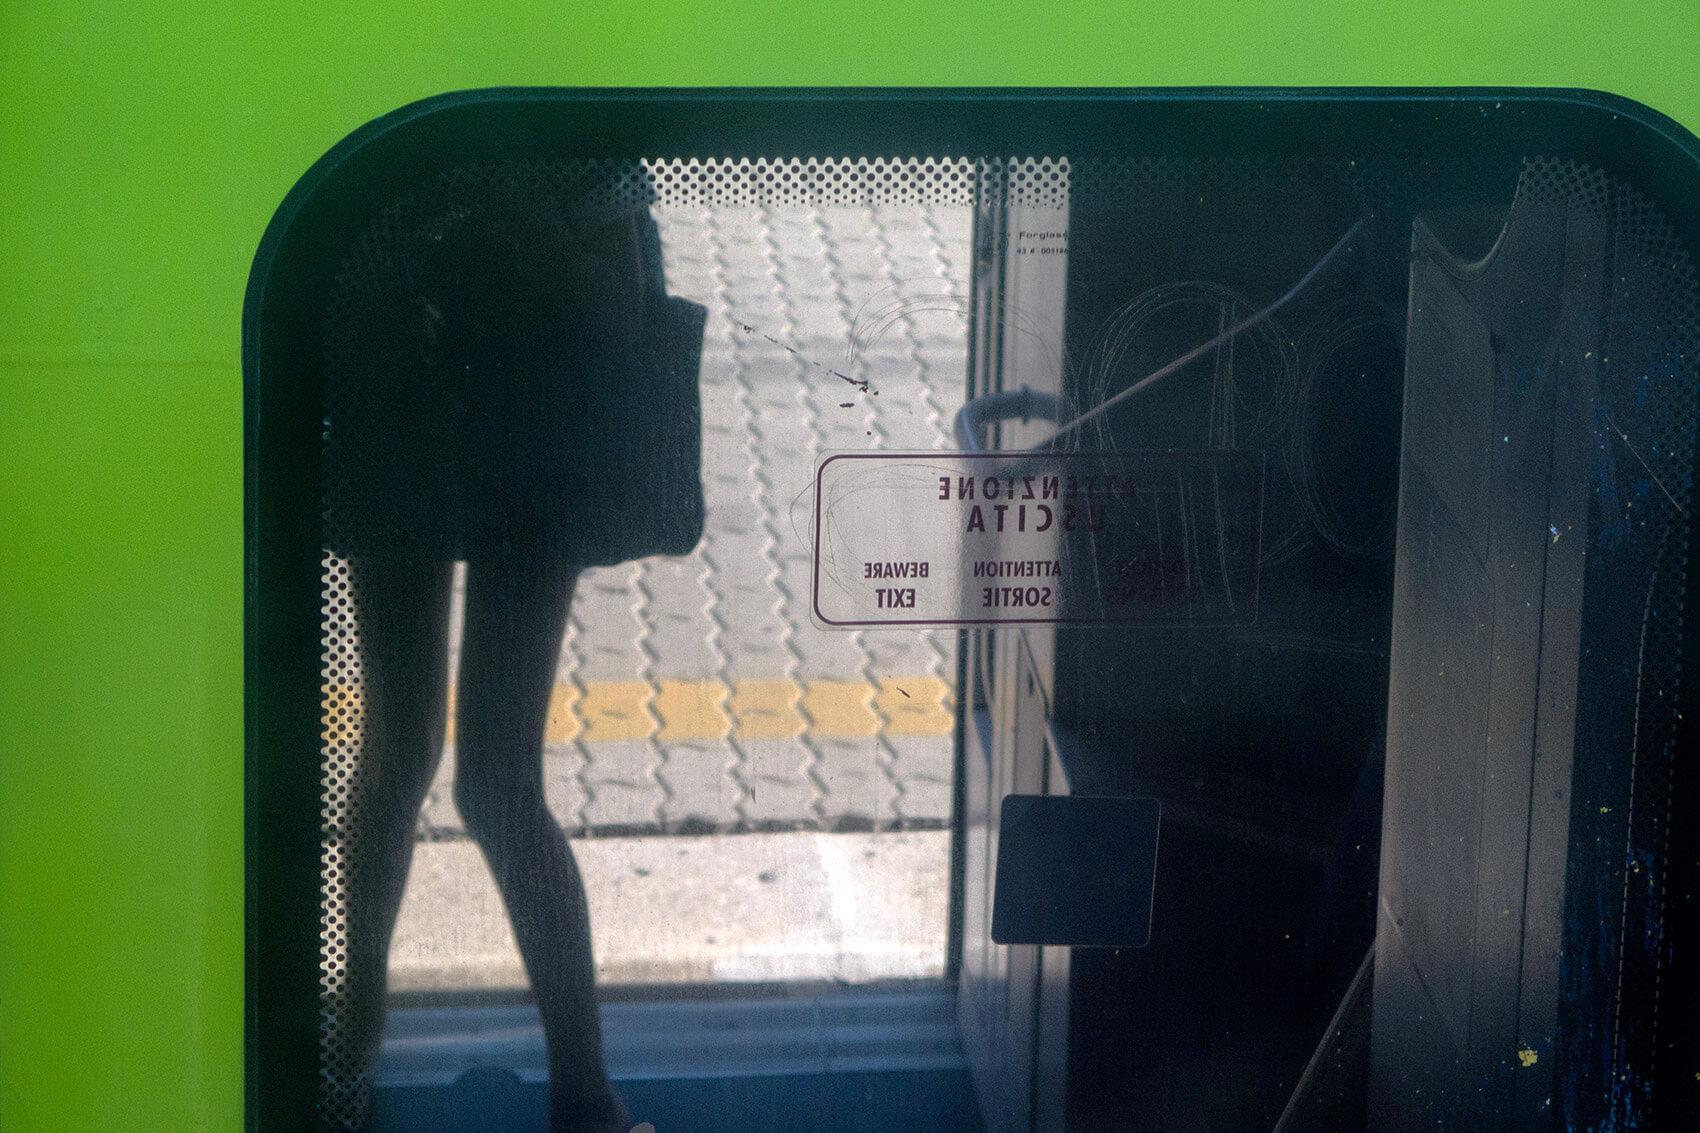 Girl getting into train